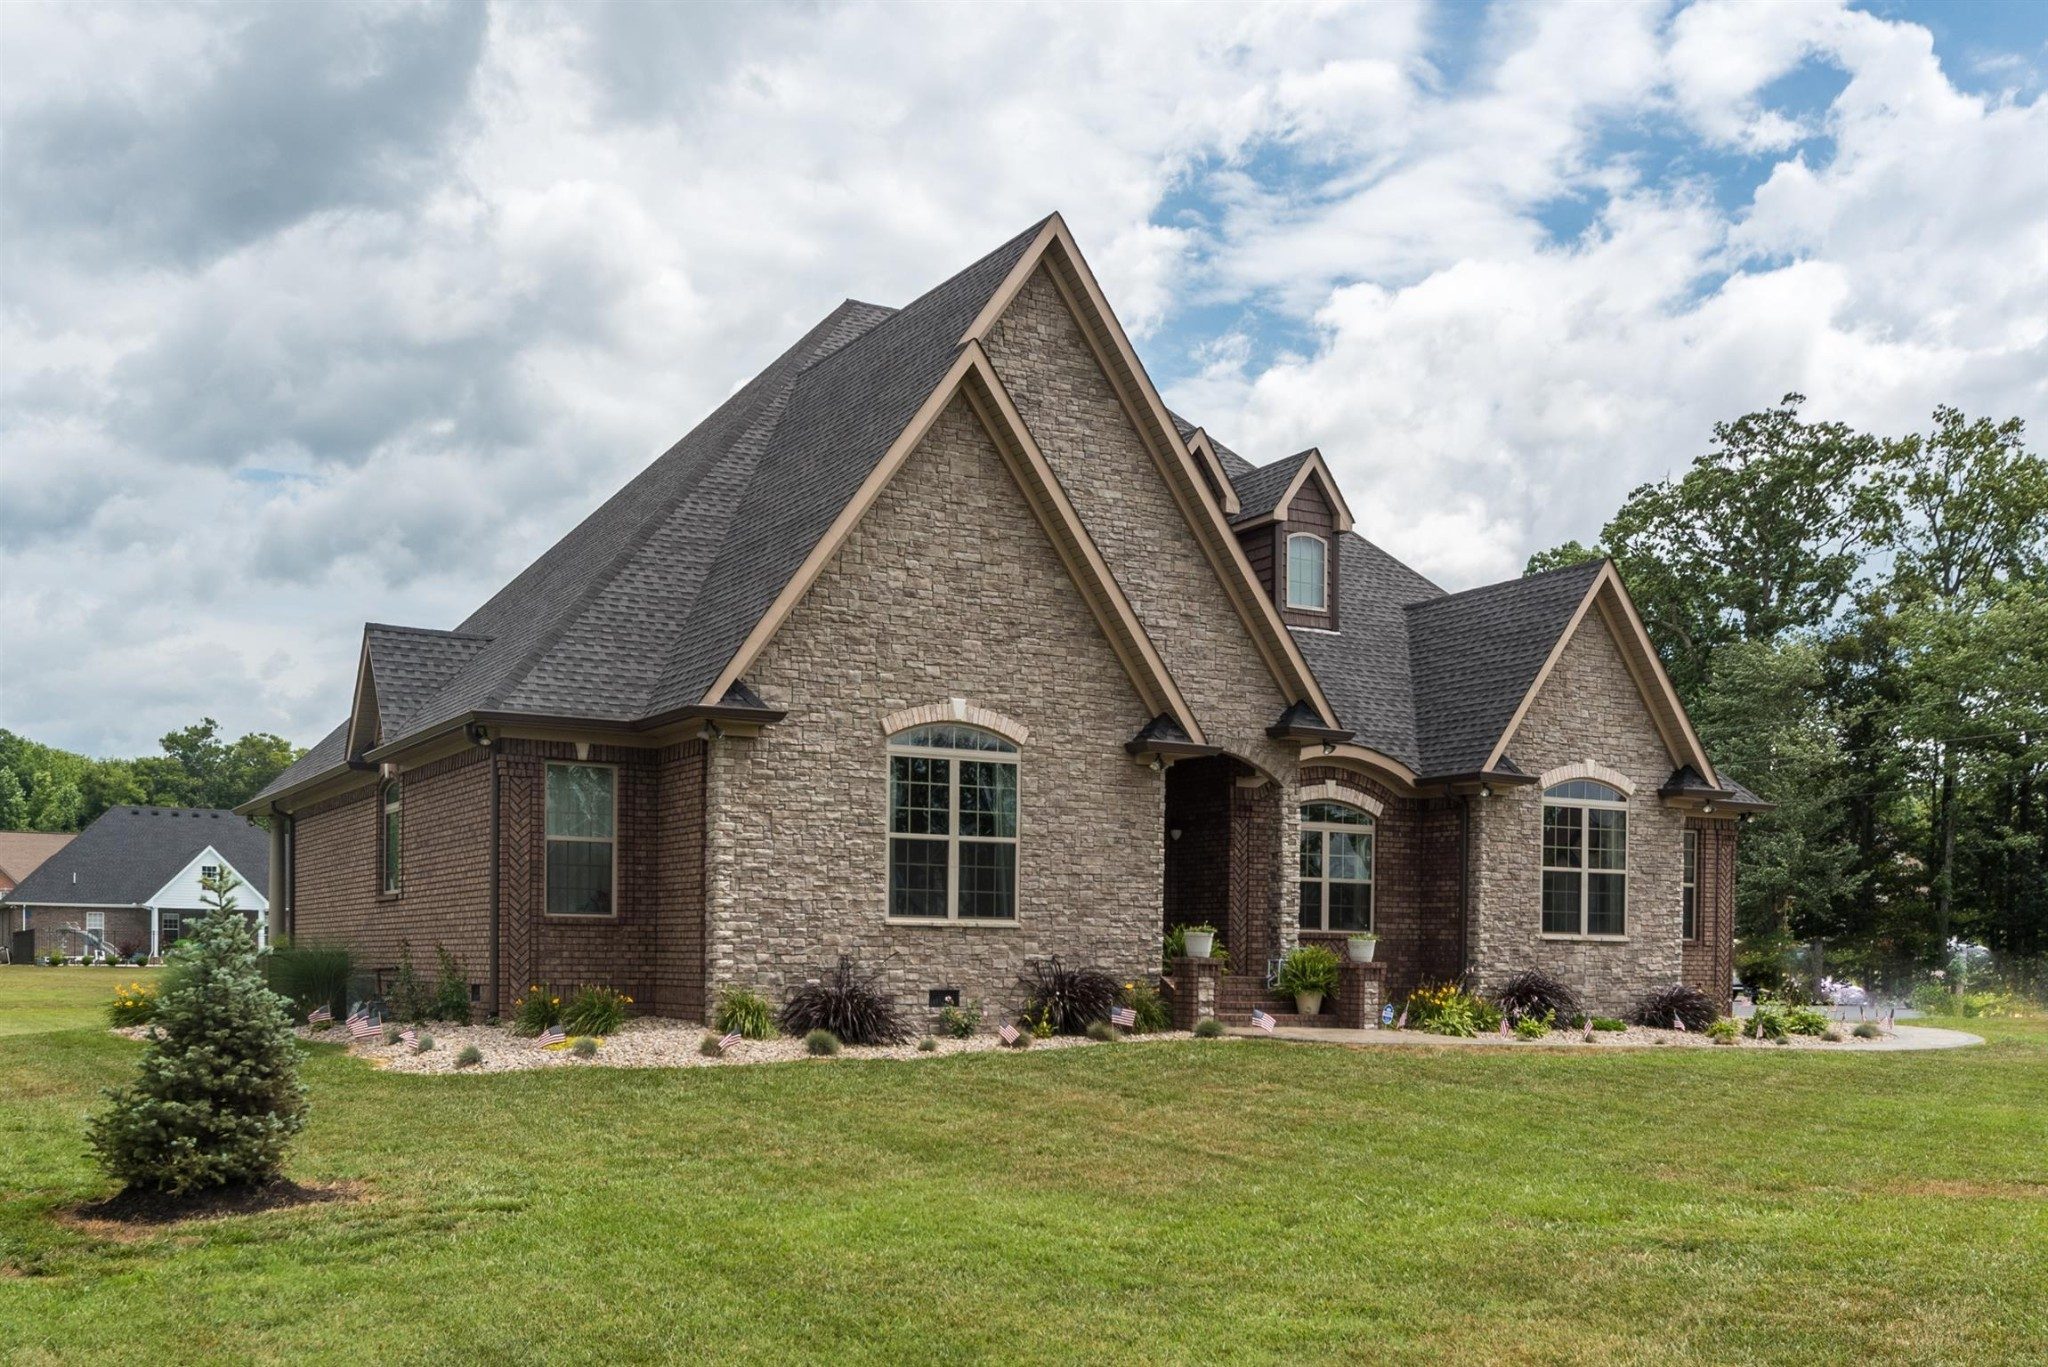 159 William Cir, Lafayette, TN 37083 - Lafayette, TN real estate listing